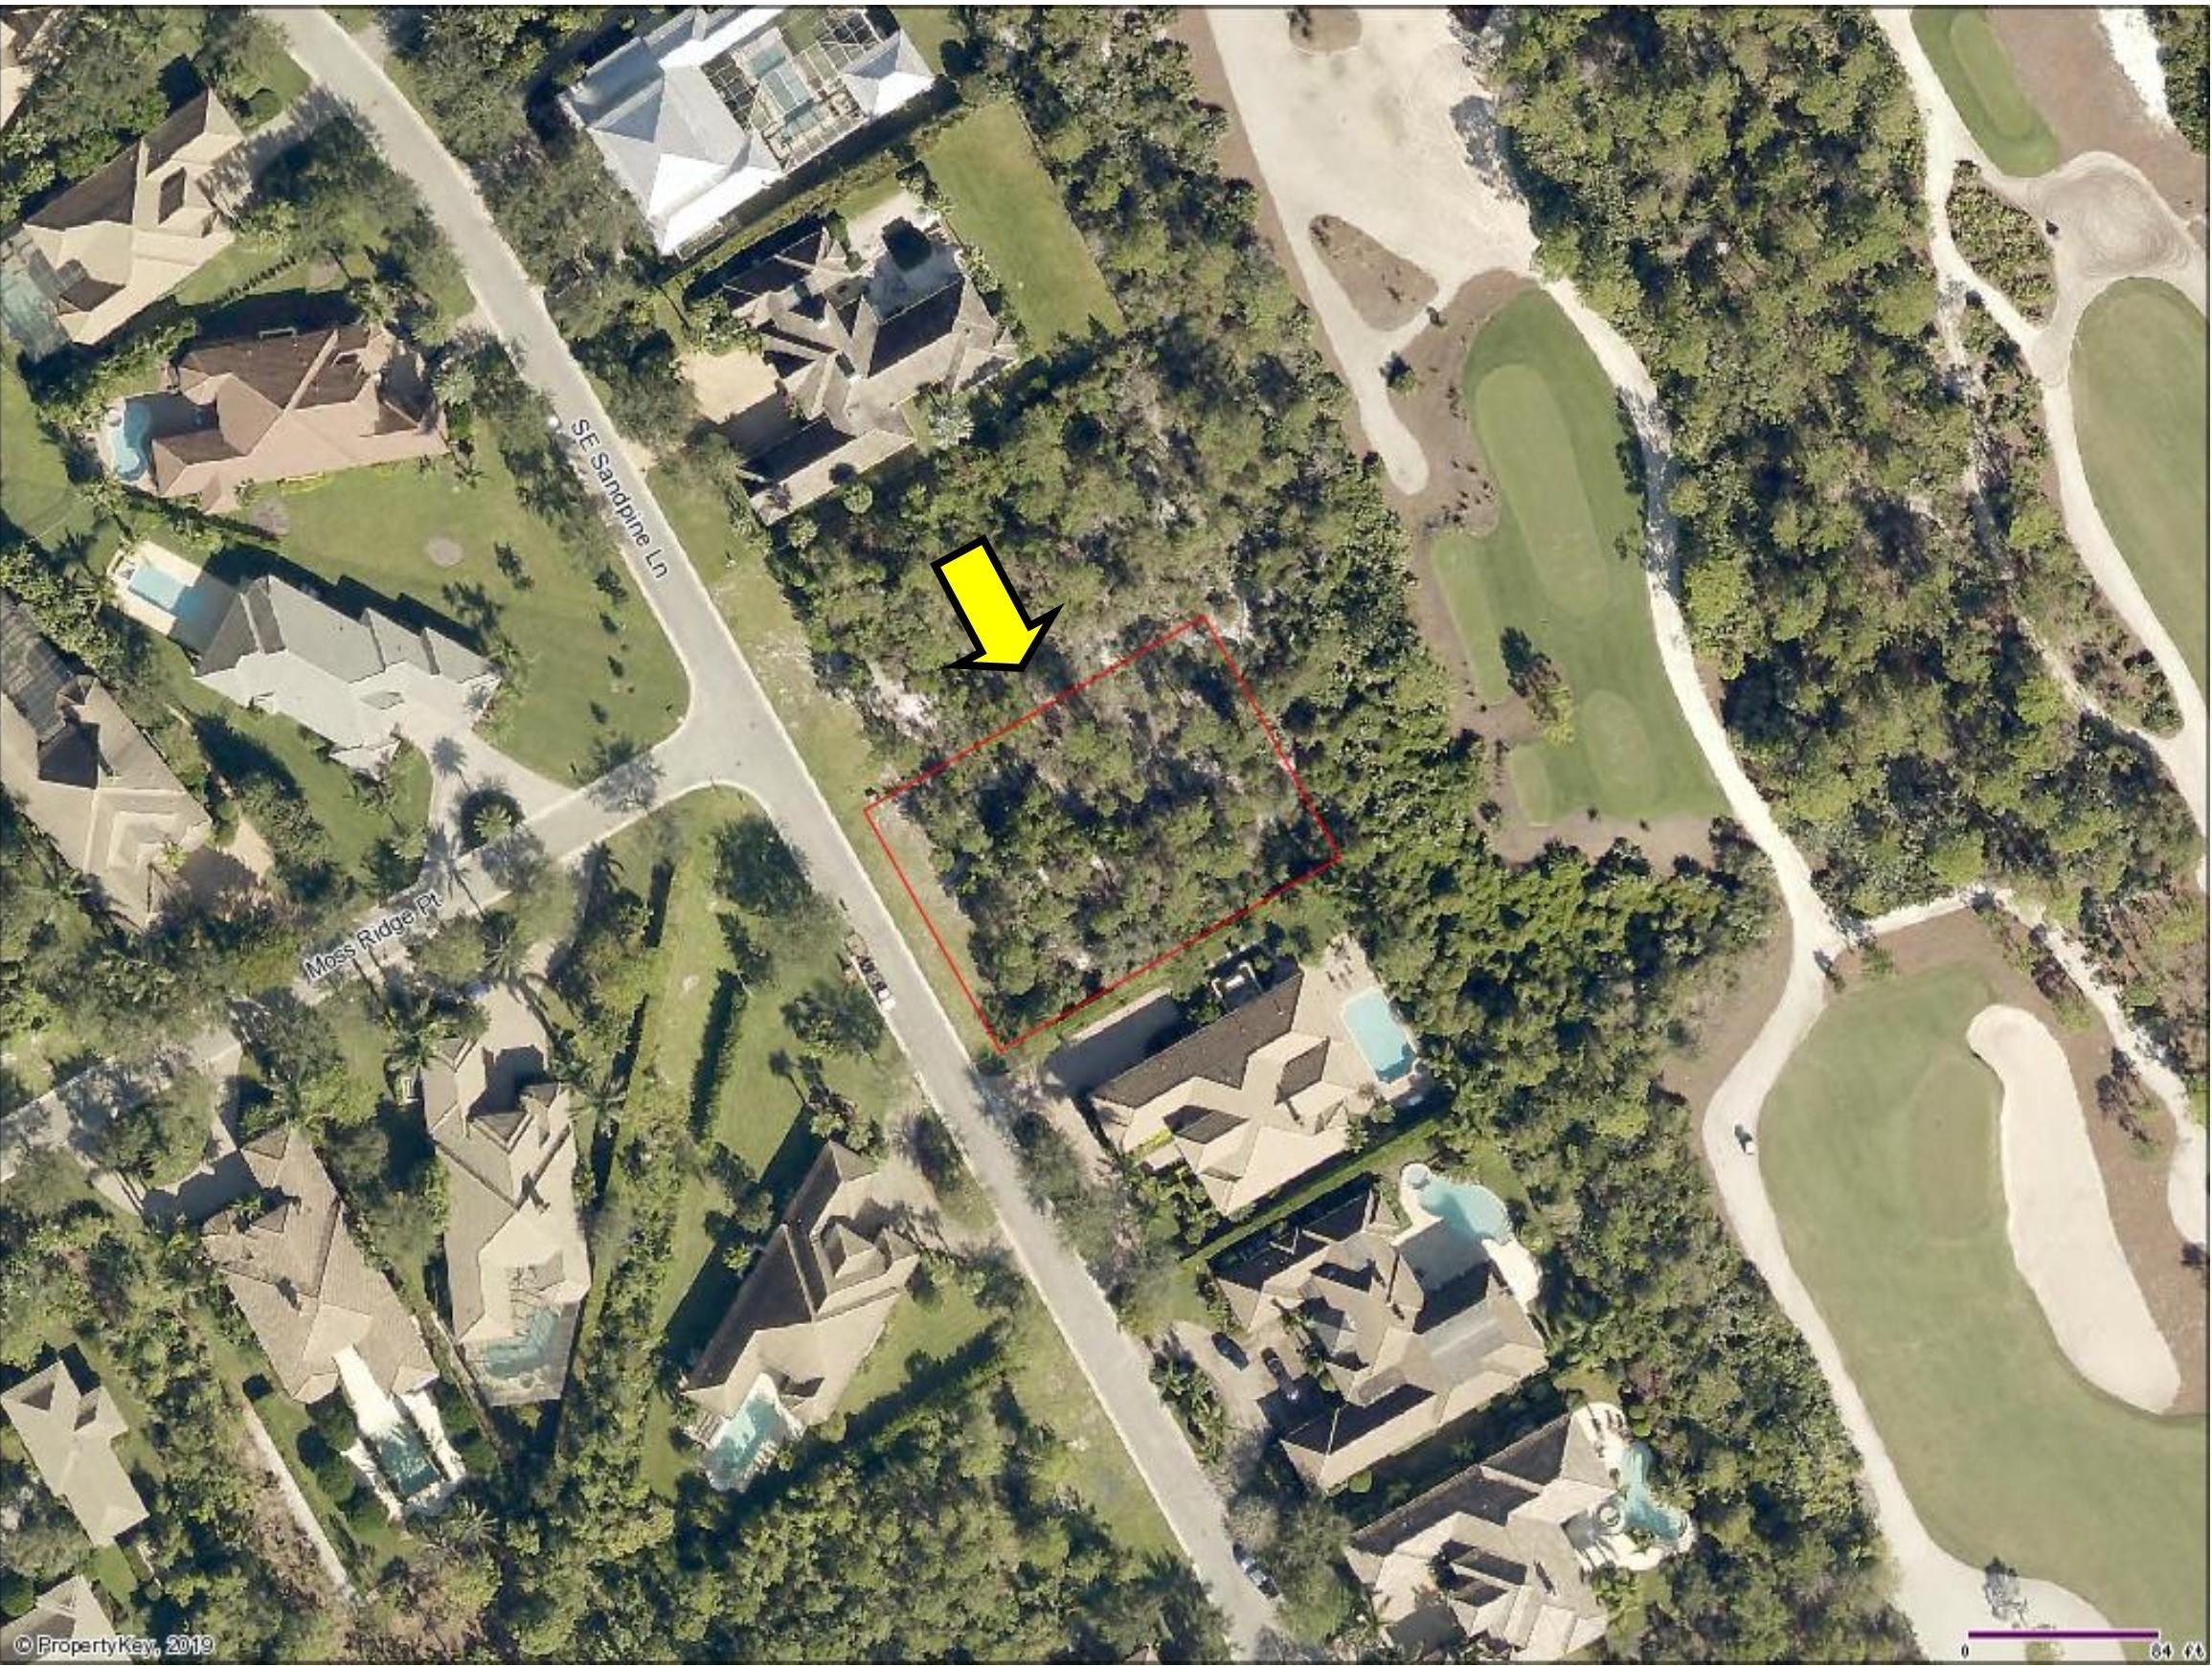 9915 Sandpine Lane, Hobe Sound, Florida 33455, ,C,Single family,Sandpine,RX-10526552